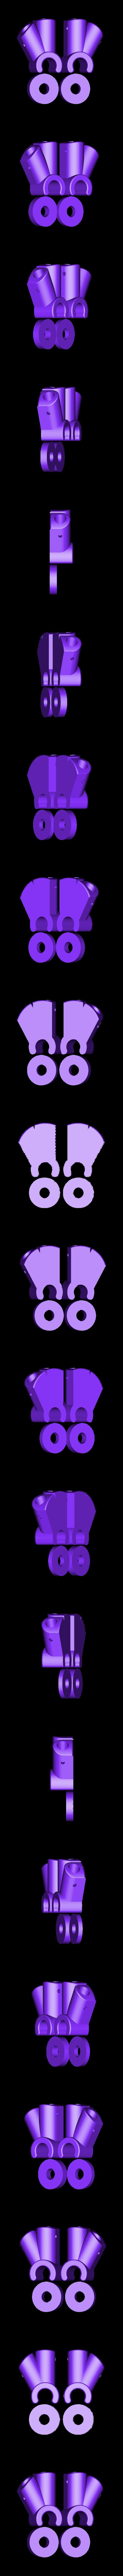 SPOOL_BRACKET_TOP_V1.stl Download free STL file  Thing-O-Matic Filament Spool Bracket • 3D printable object, WorksBySolo